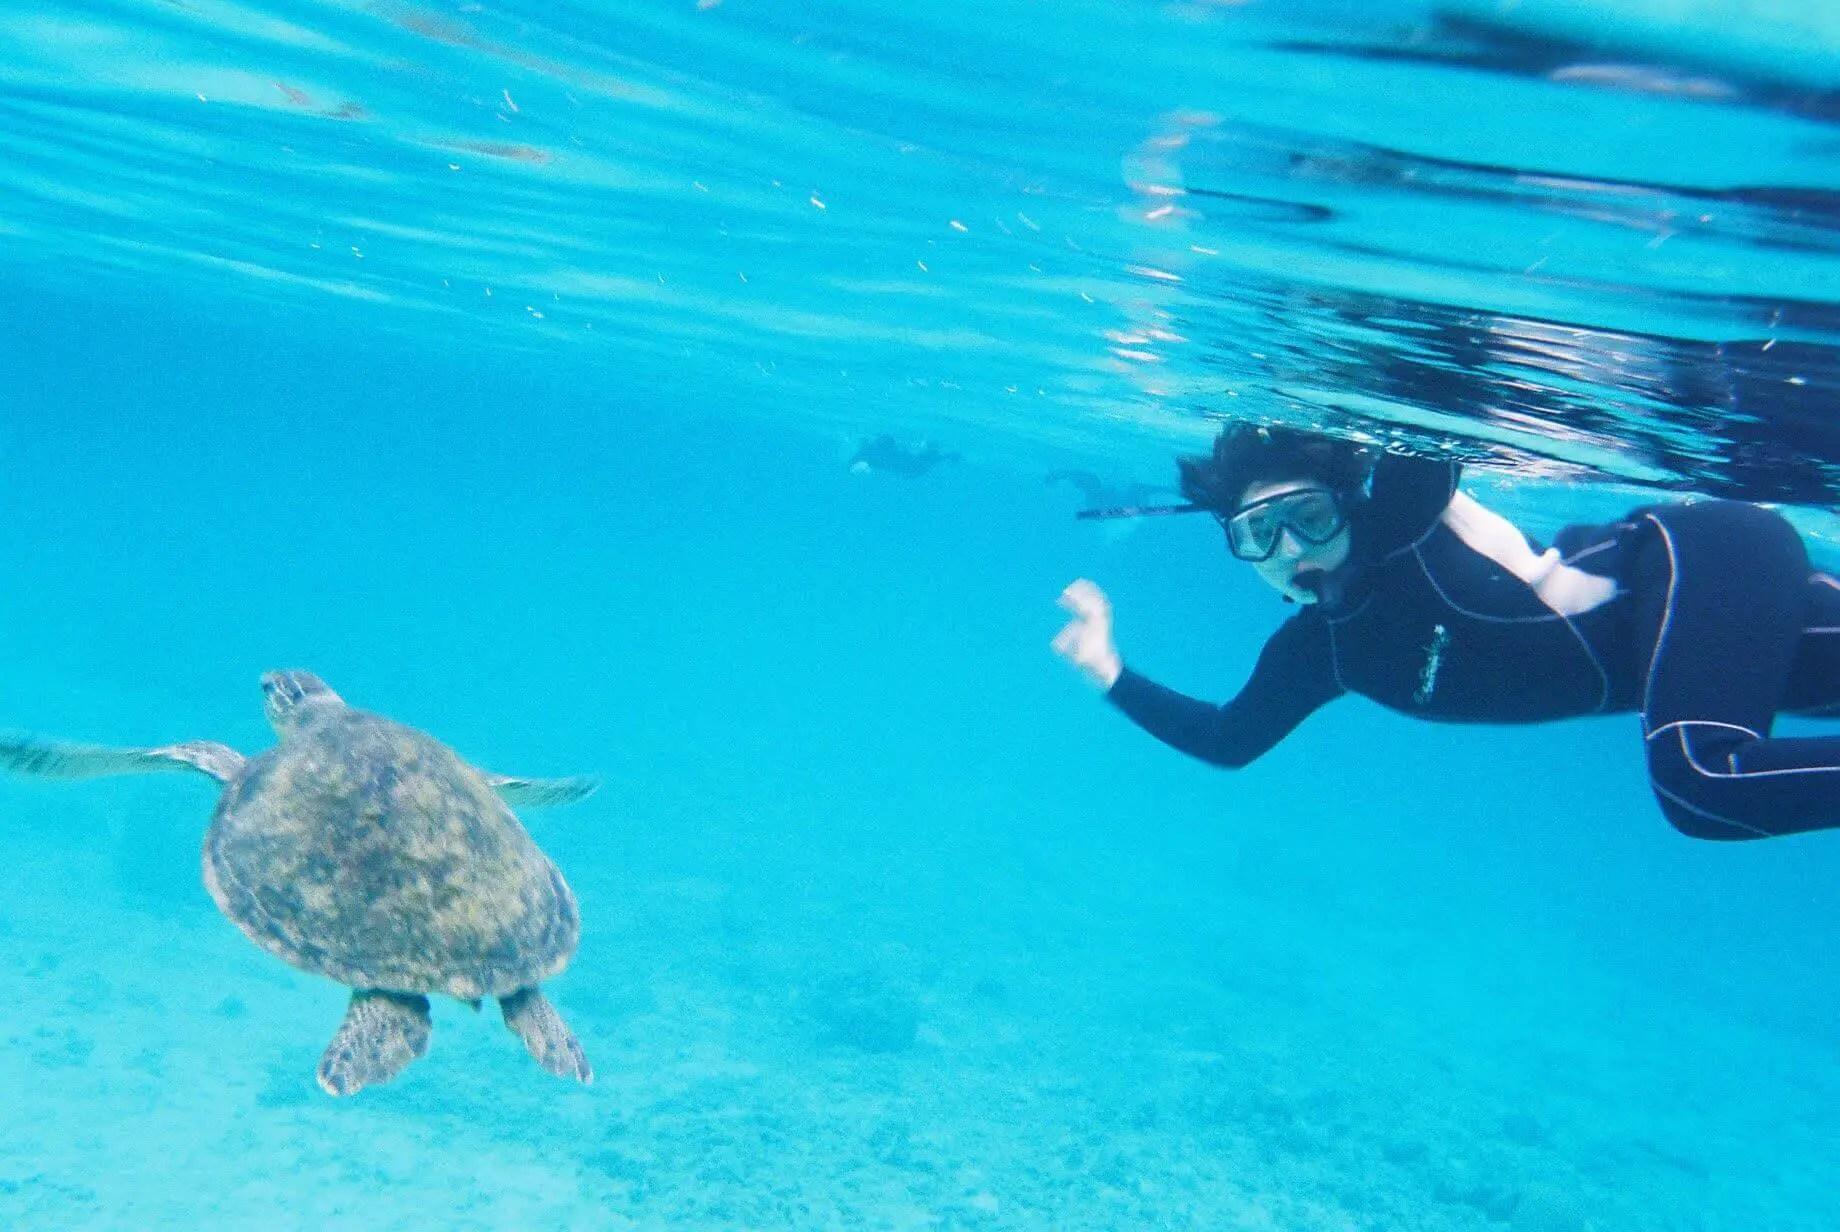 The Nikonos V snorkelling in Amami, Japan